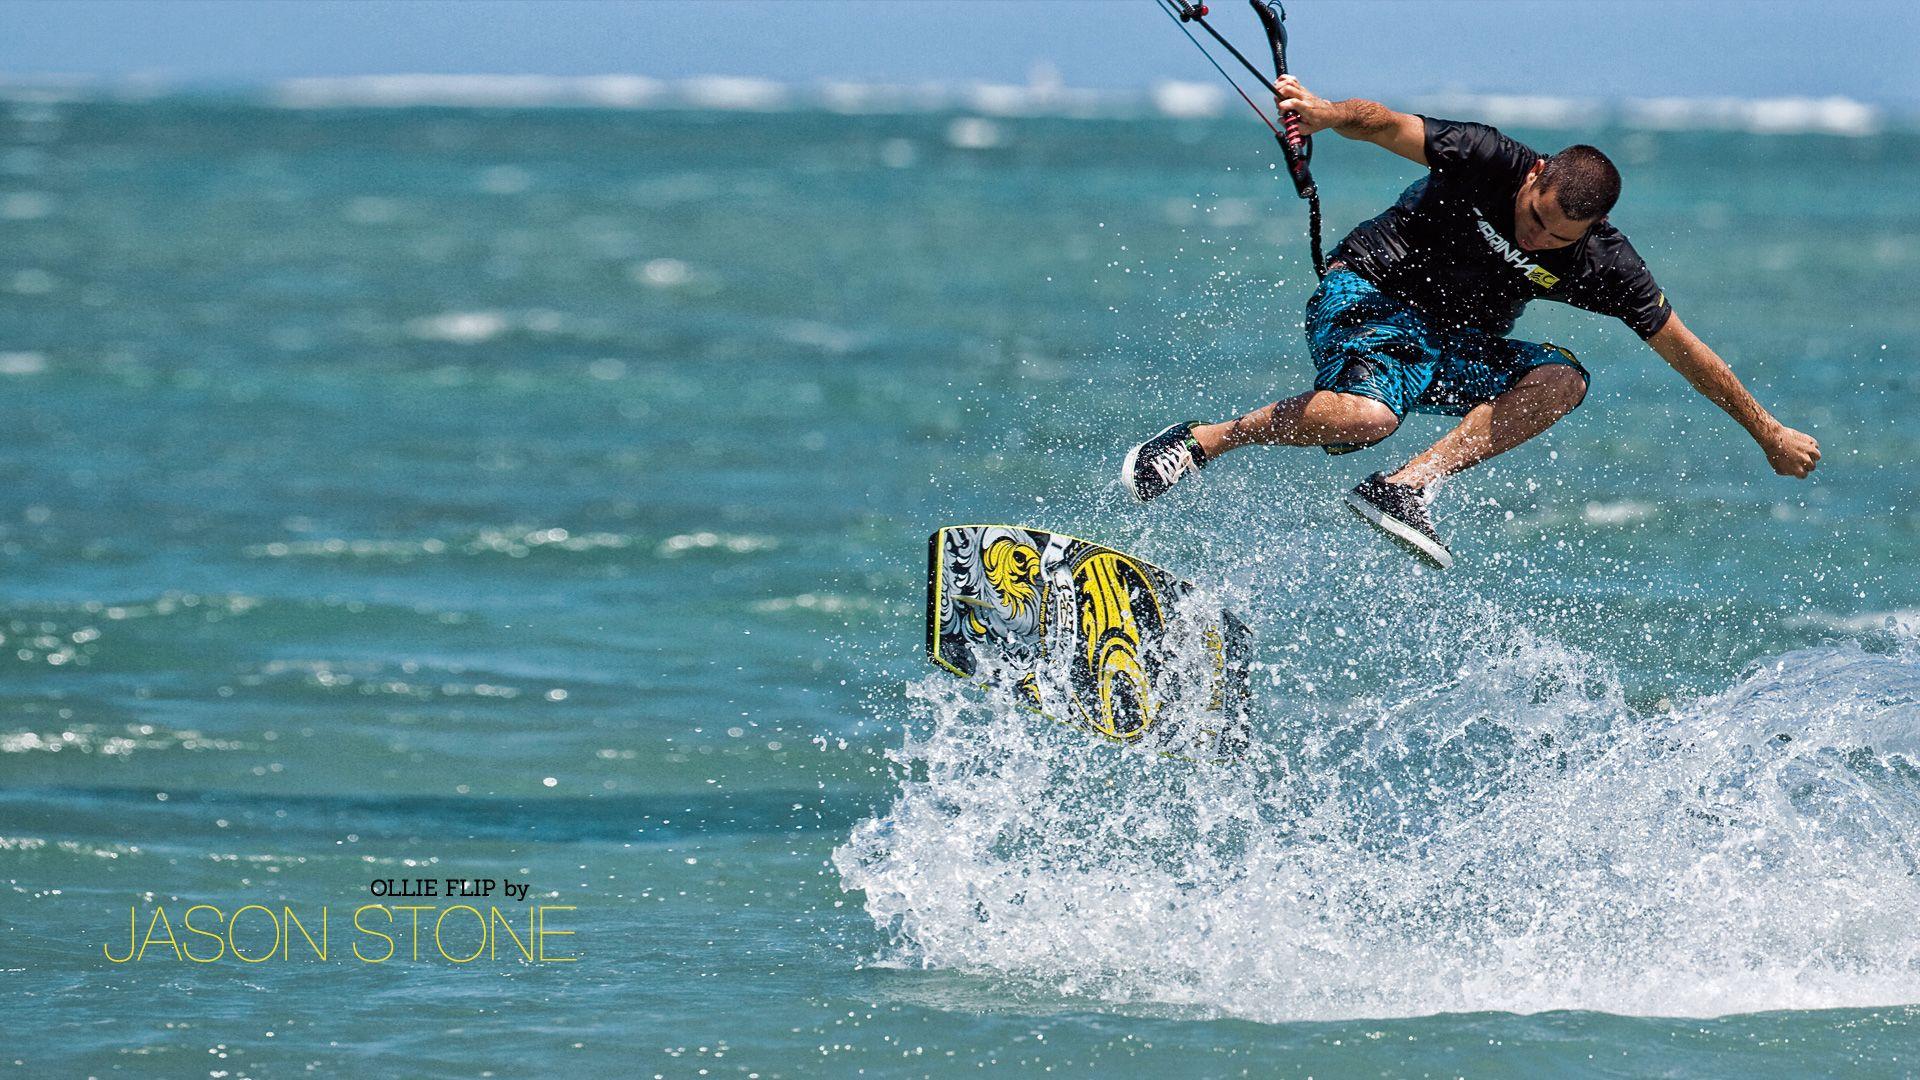 Best High resolution kitesurf wallpapers images on Pinterest